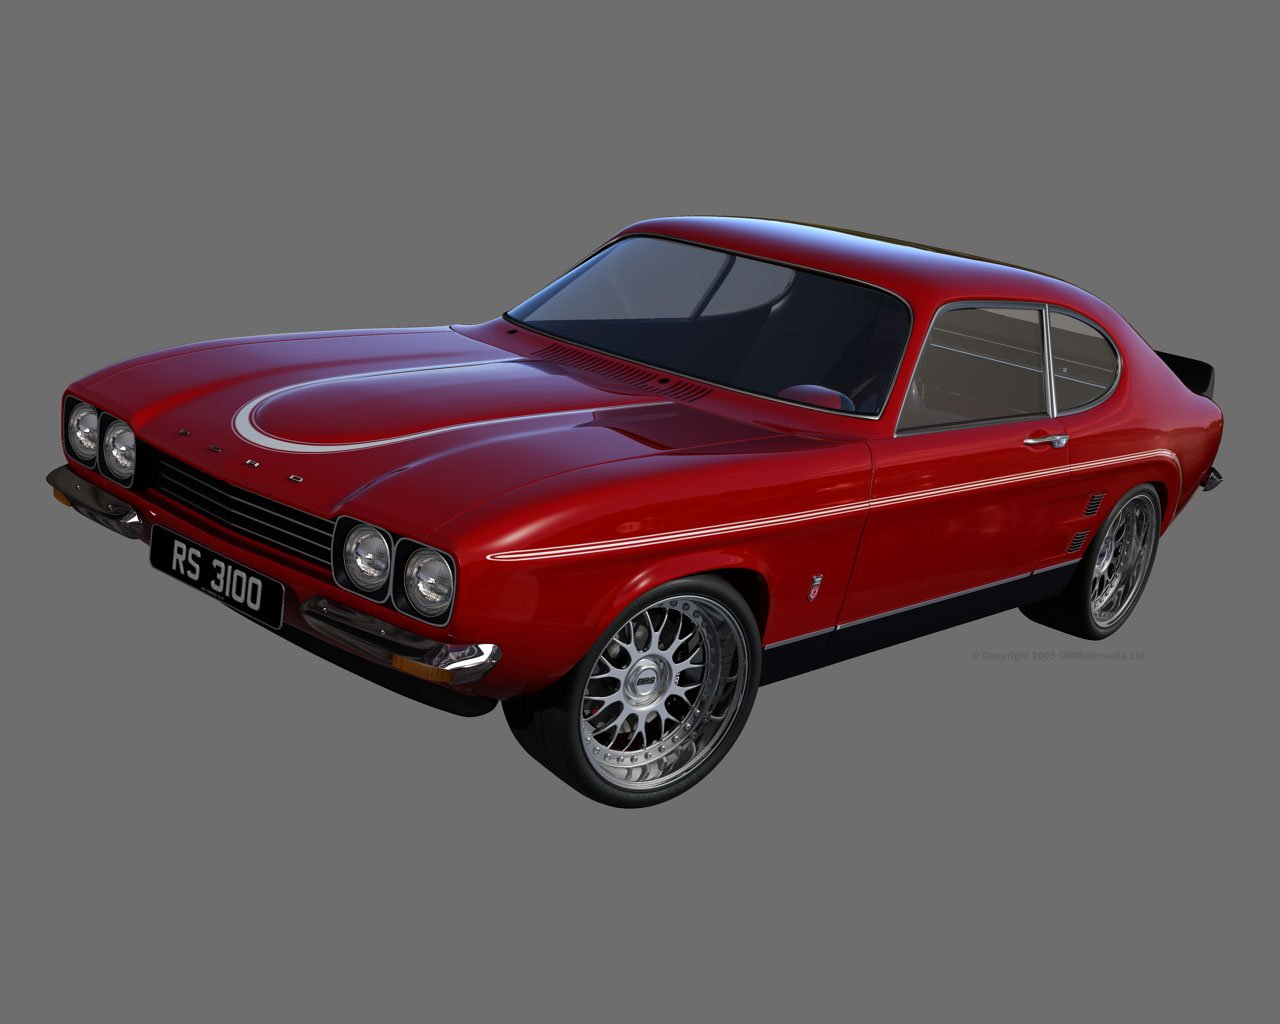 D M Multimedia 3D Cars Capri MKI Capri MK1 Wallpapers 1280x1024